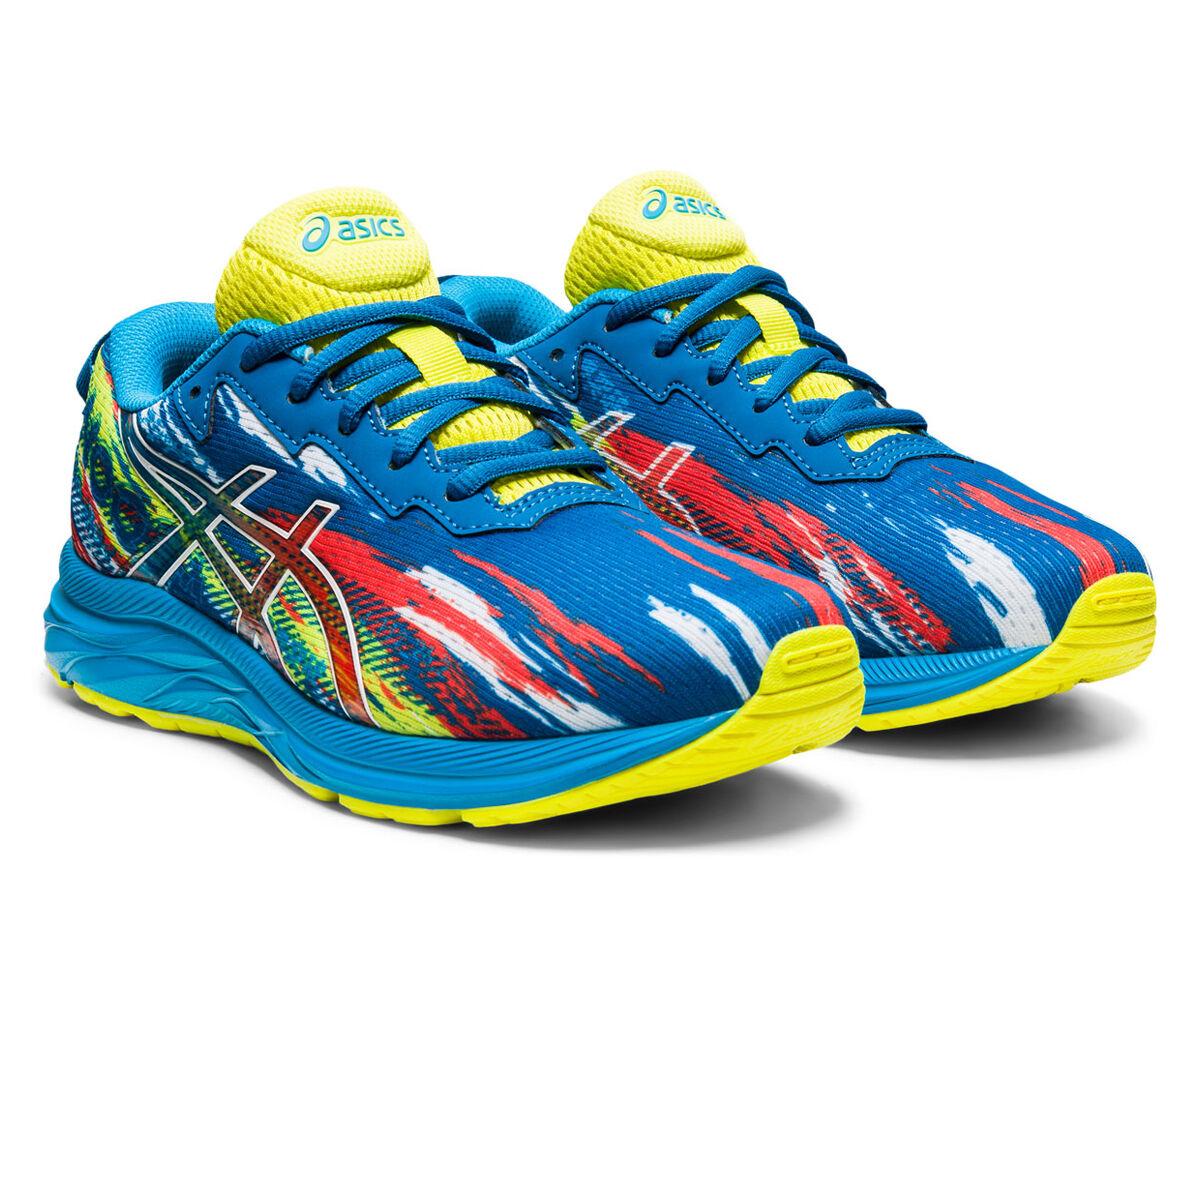 nike jordan flight origin 2 blue eyes full version | Asics GEL Noosa Tri 13 Kids Running Shoes